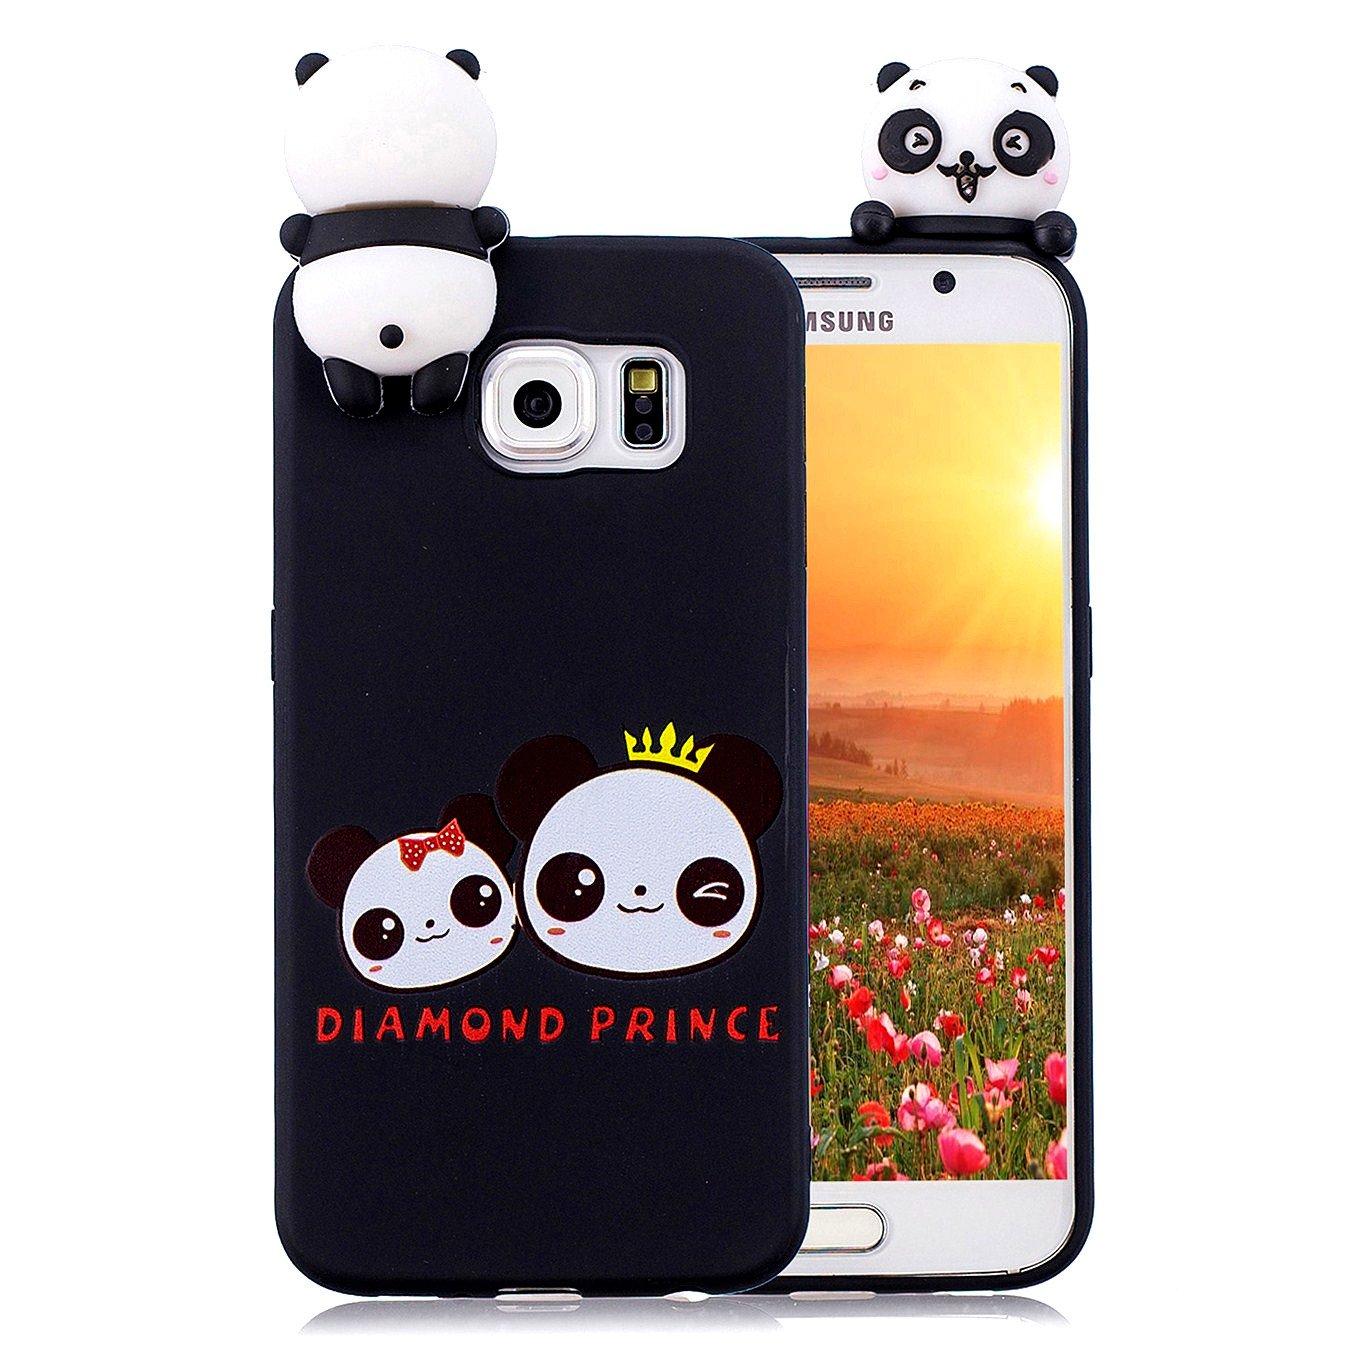 Nicht f/ür S6 Hancda H/ülle f/ür Samsung Galaxy S6 Edge Schutzh/ülle Handyh/ülle Silikon H/ülle Case Cover Gummi Silikonh/ülle TPU Ultra D/ünn Weich Case Handytasche f/ür Samsung Galaxy S6 Edge,05 Design